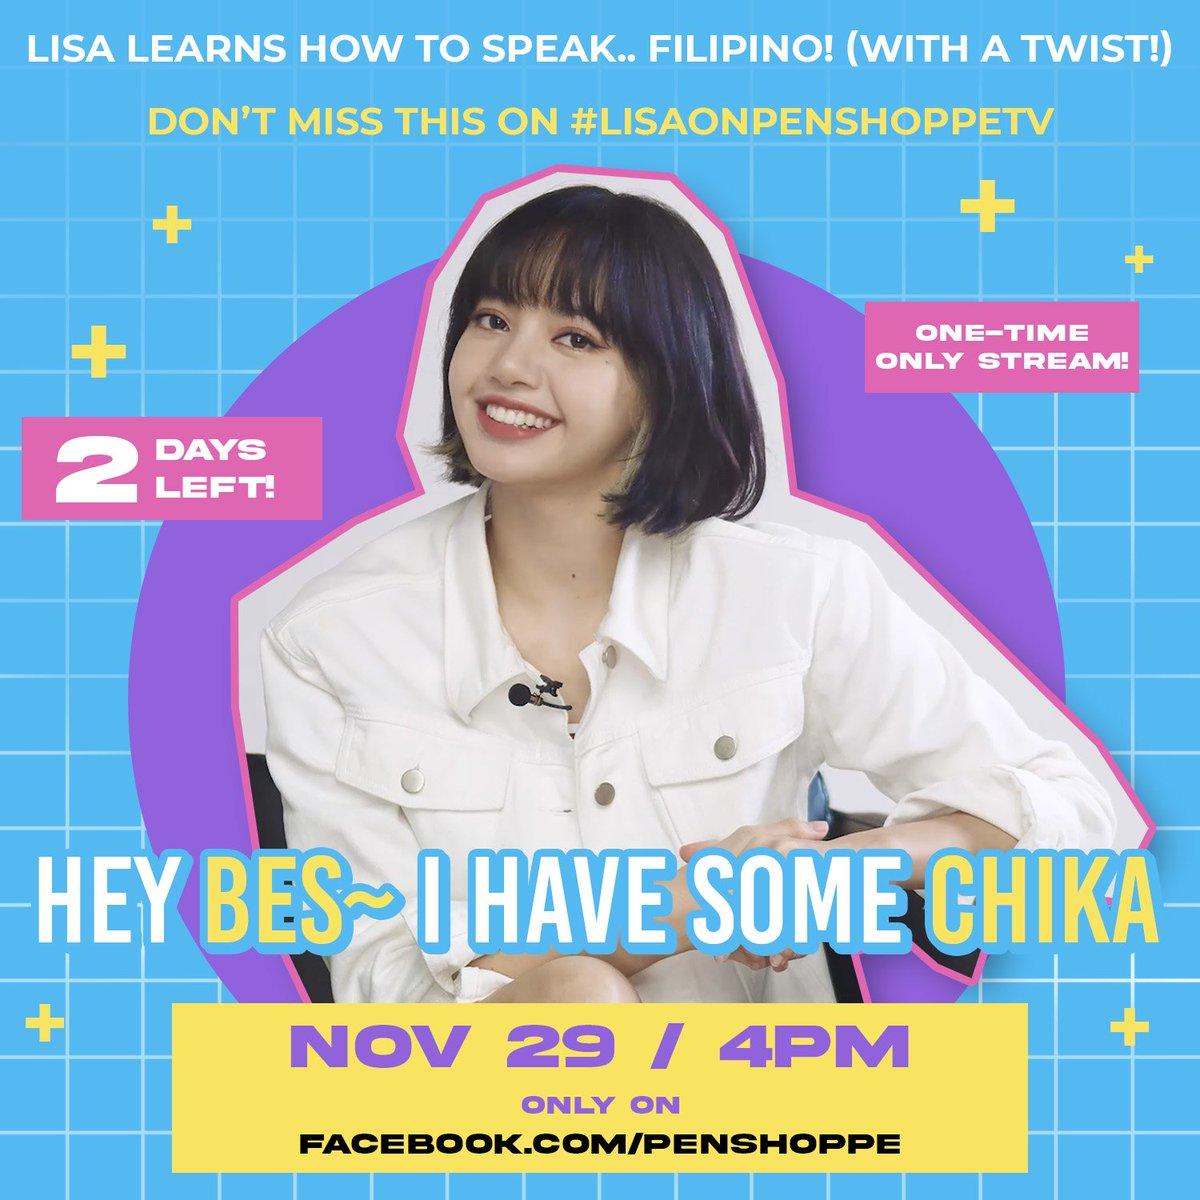 Pas kemarin ♥️  Lisa cantik banget Dapat asupan lagi dari Penshoppe  Live streaming di Facebook Penshoppe Huu gak sabar lihat teh lisa😍💗 #LisaOnPenshoppeTVTODAY  #LISA